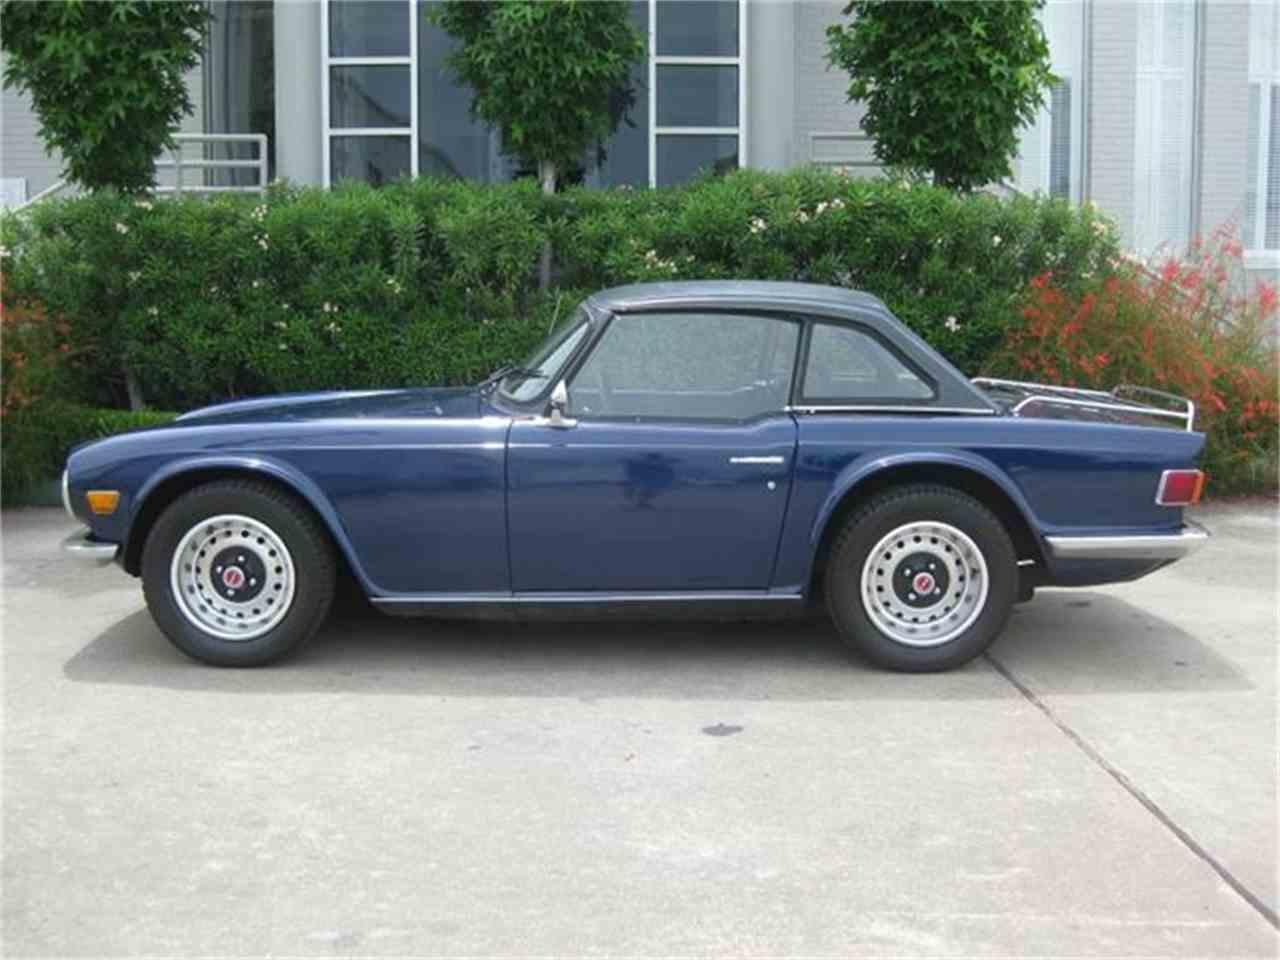 Classic Cars For Sale Houston Area: 1970 Triumph TR6 For Sale